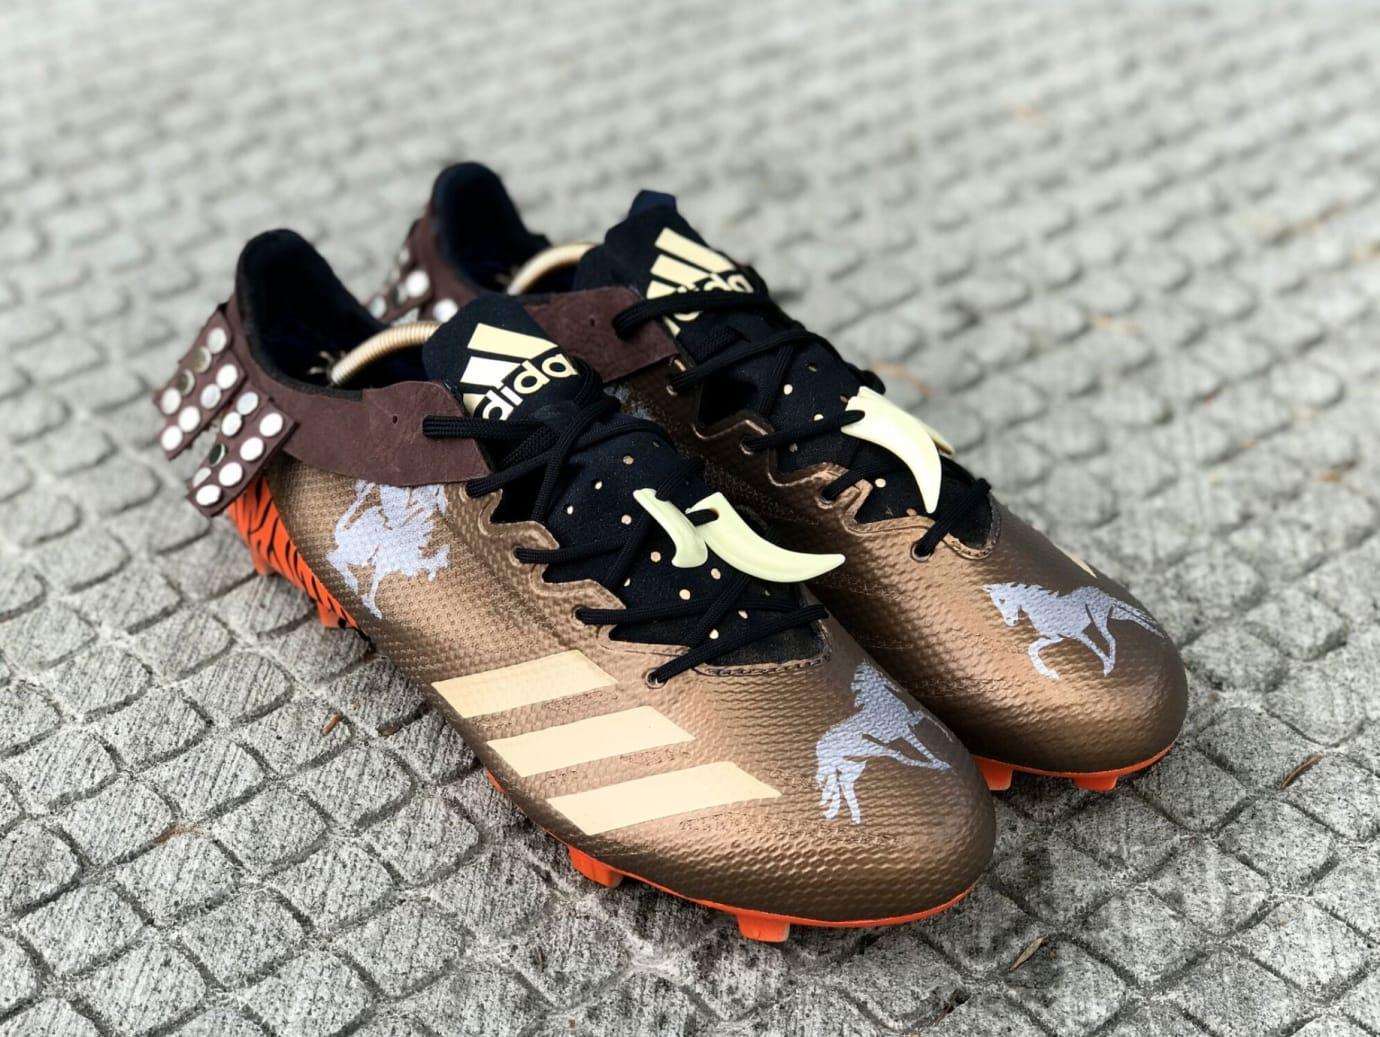 Adidas Adizero Josh Norman Maximus Cleats Top